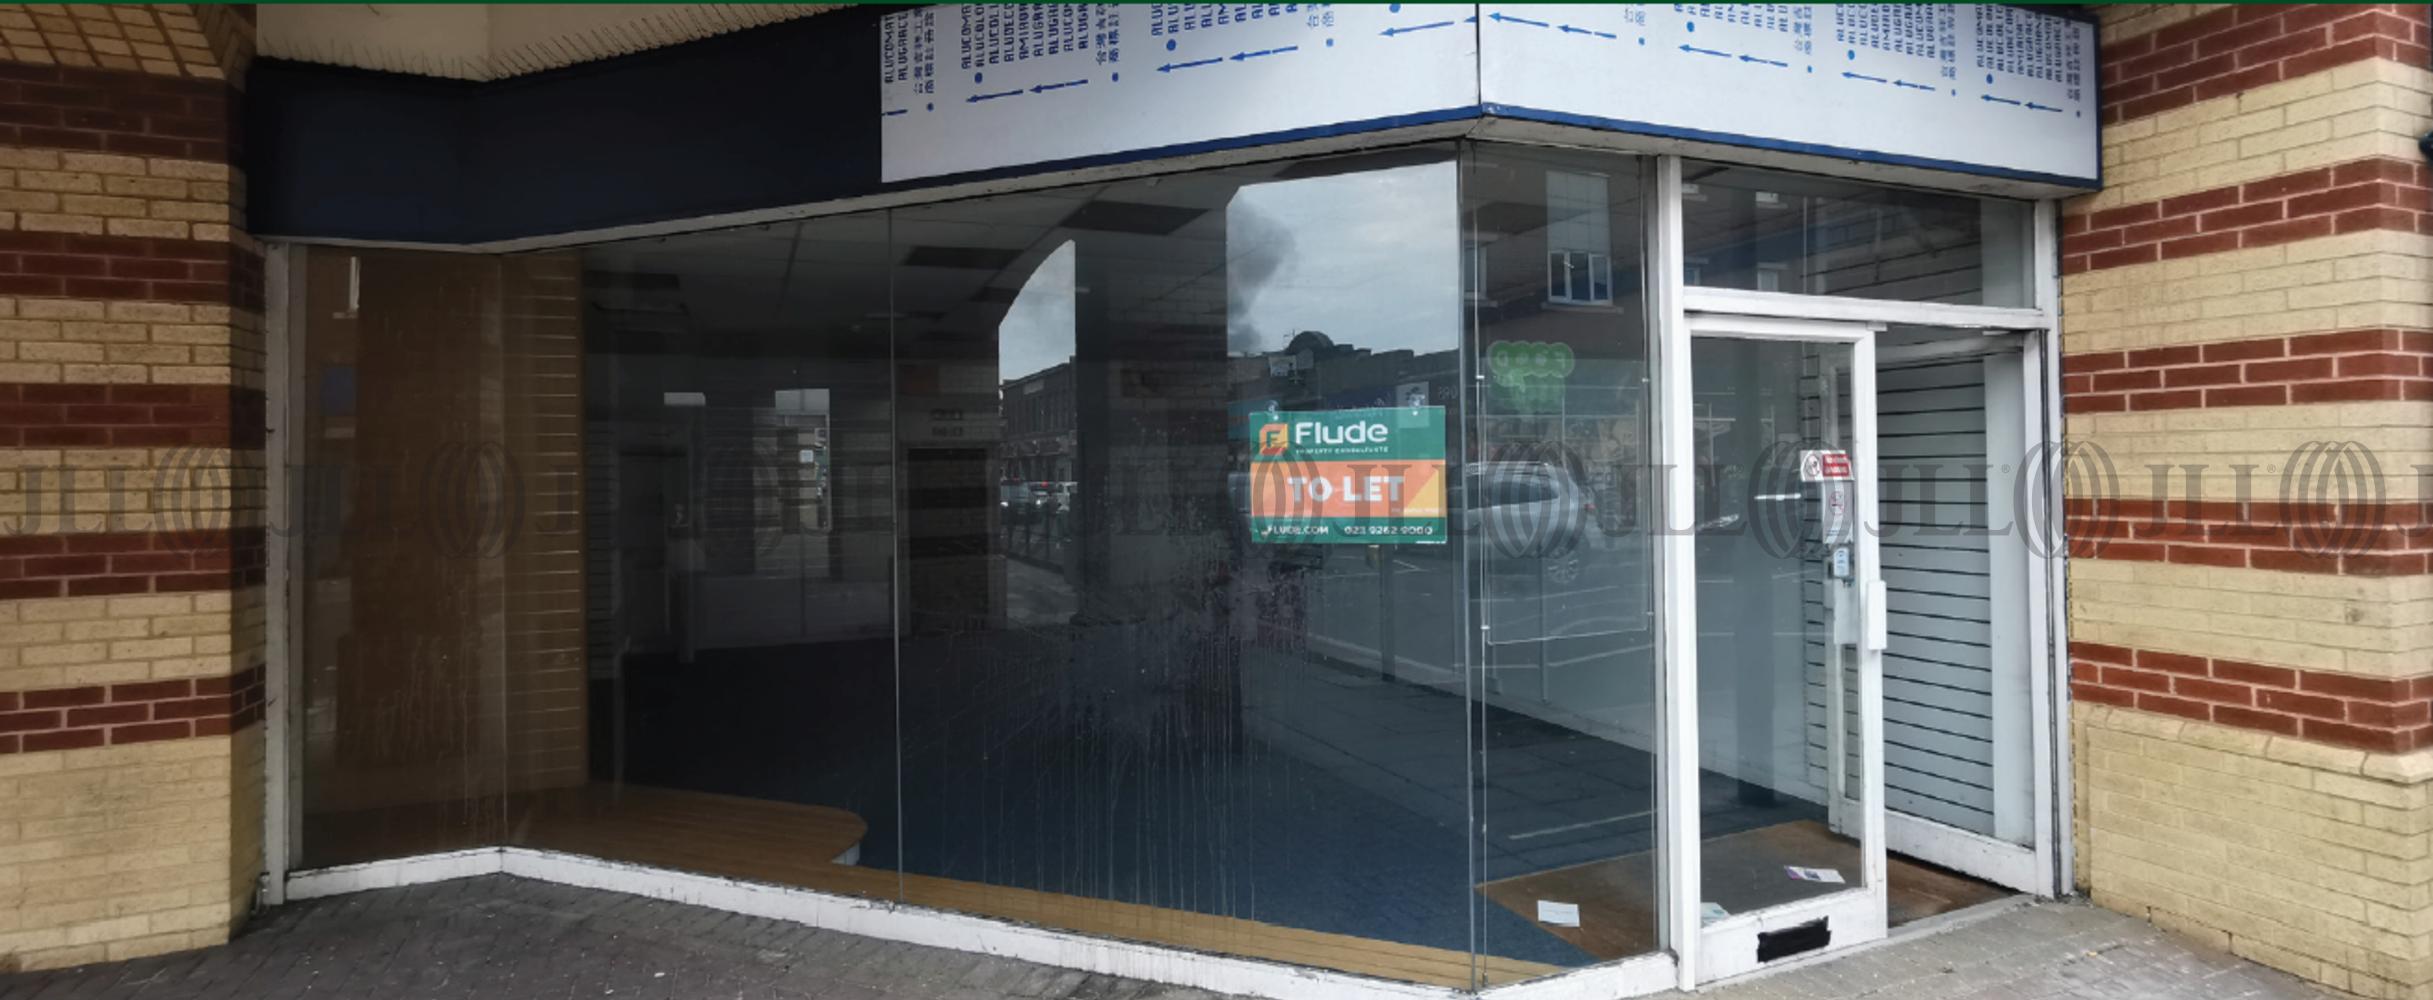 Retail shopping centre Portsmouth, PO1 5AG - Unit C